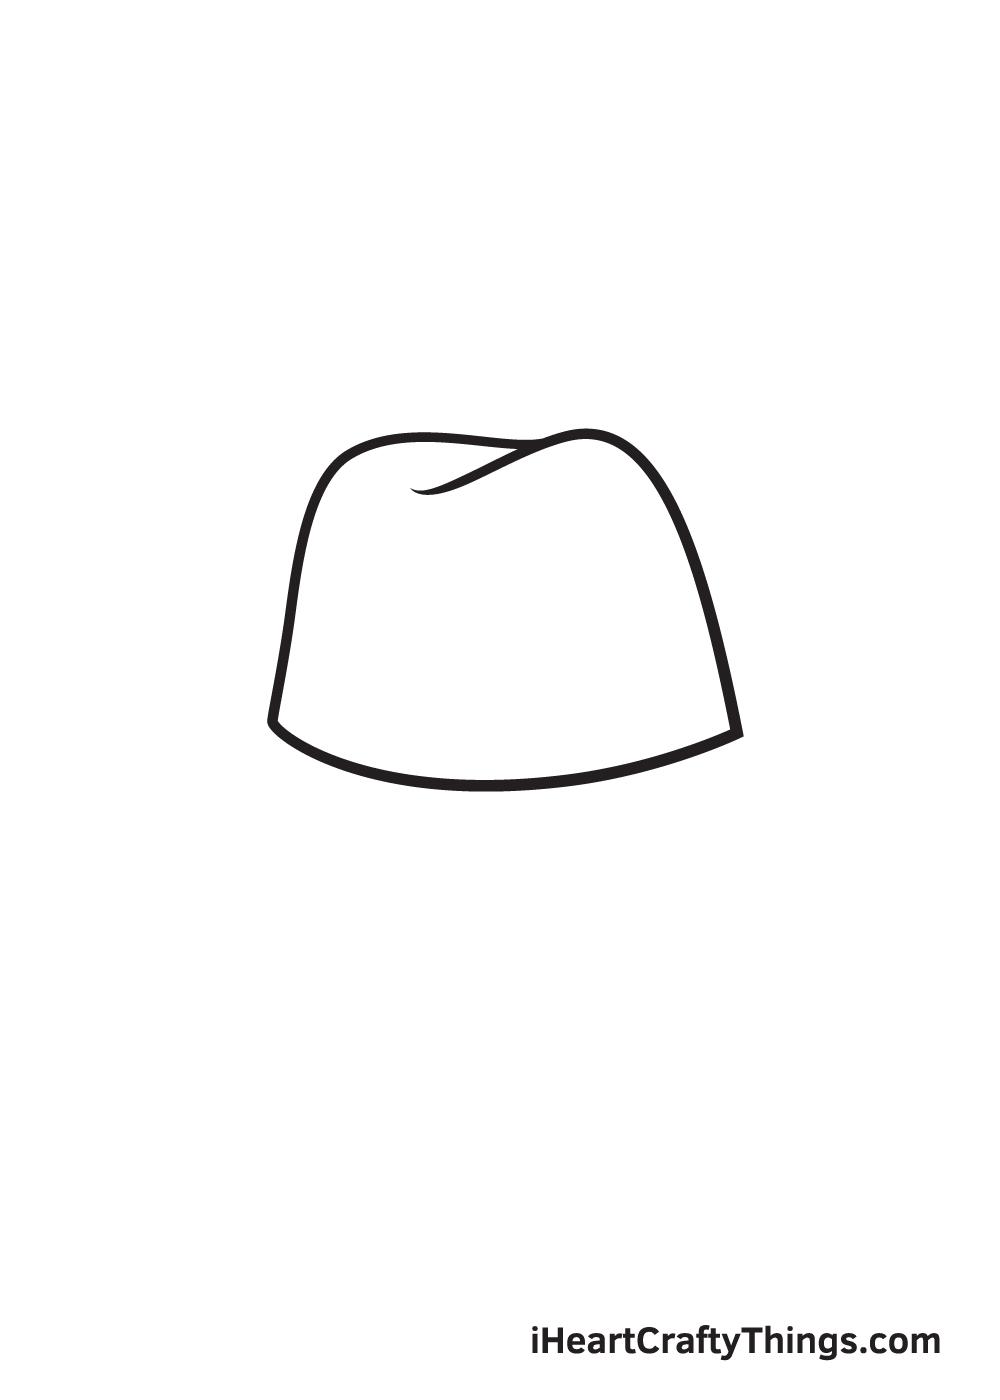 cowboy hat drawing - step 3